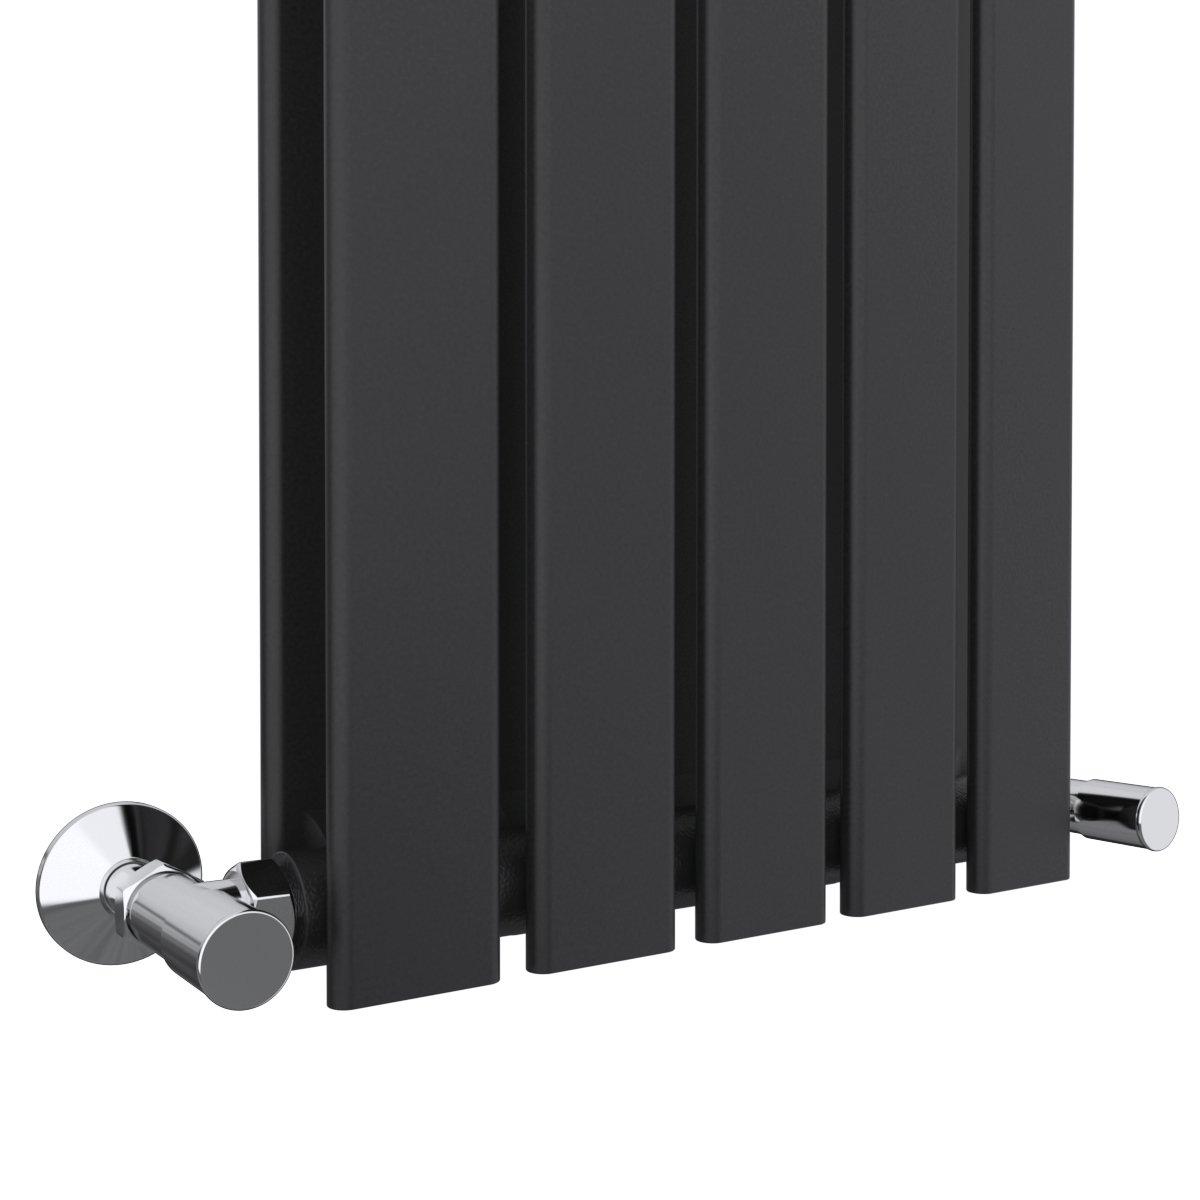 Myson Decor H11 Horizontal Single Panel